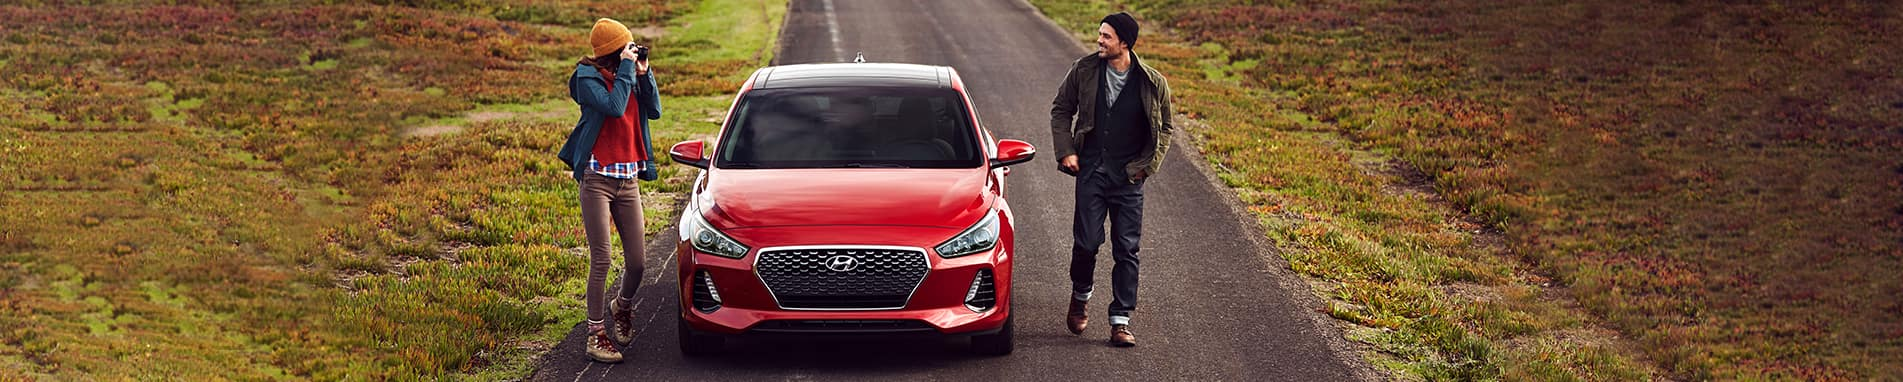 Hyundai Lease End Options at Patrick Hyundai in Schaumburg, IL